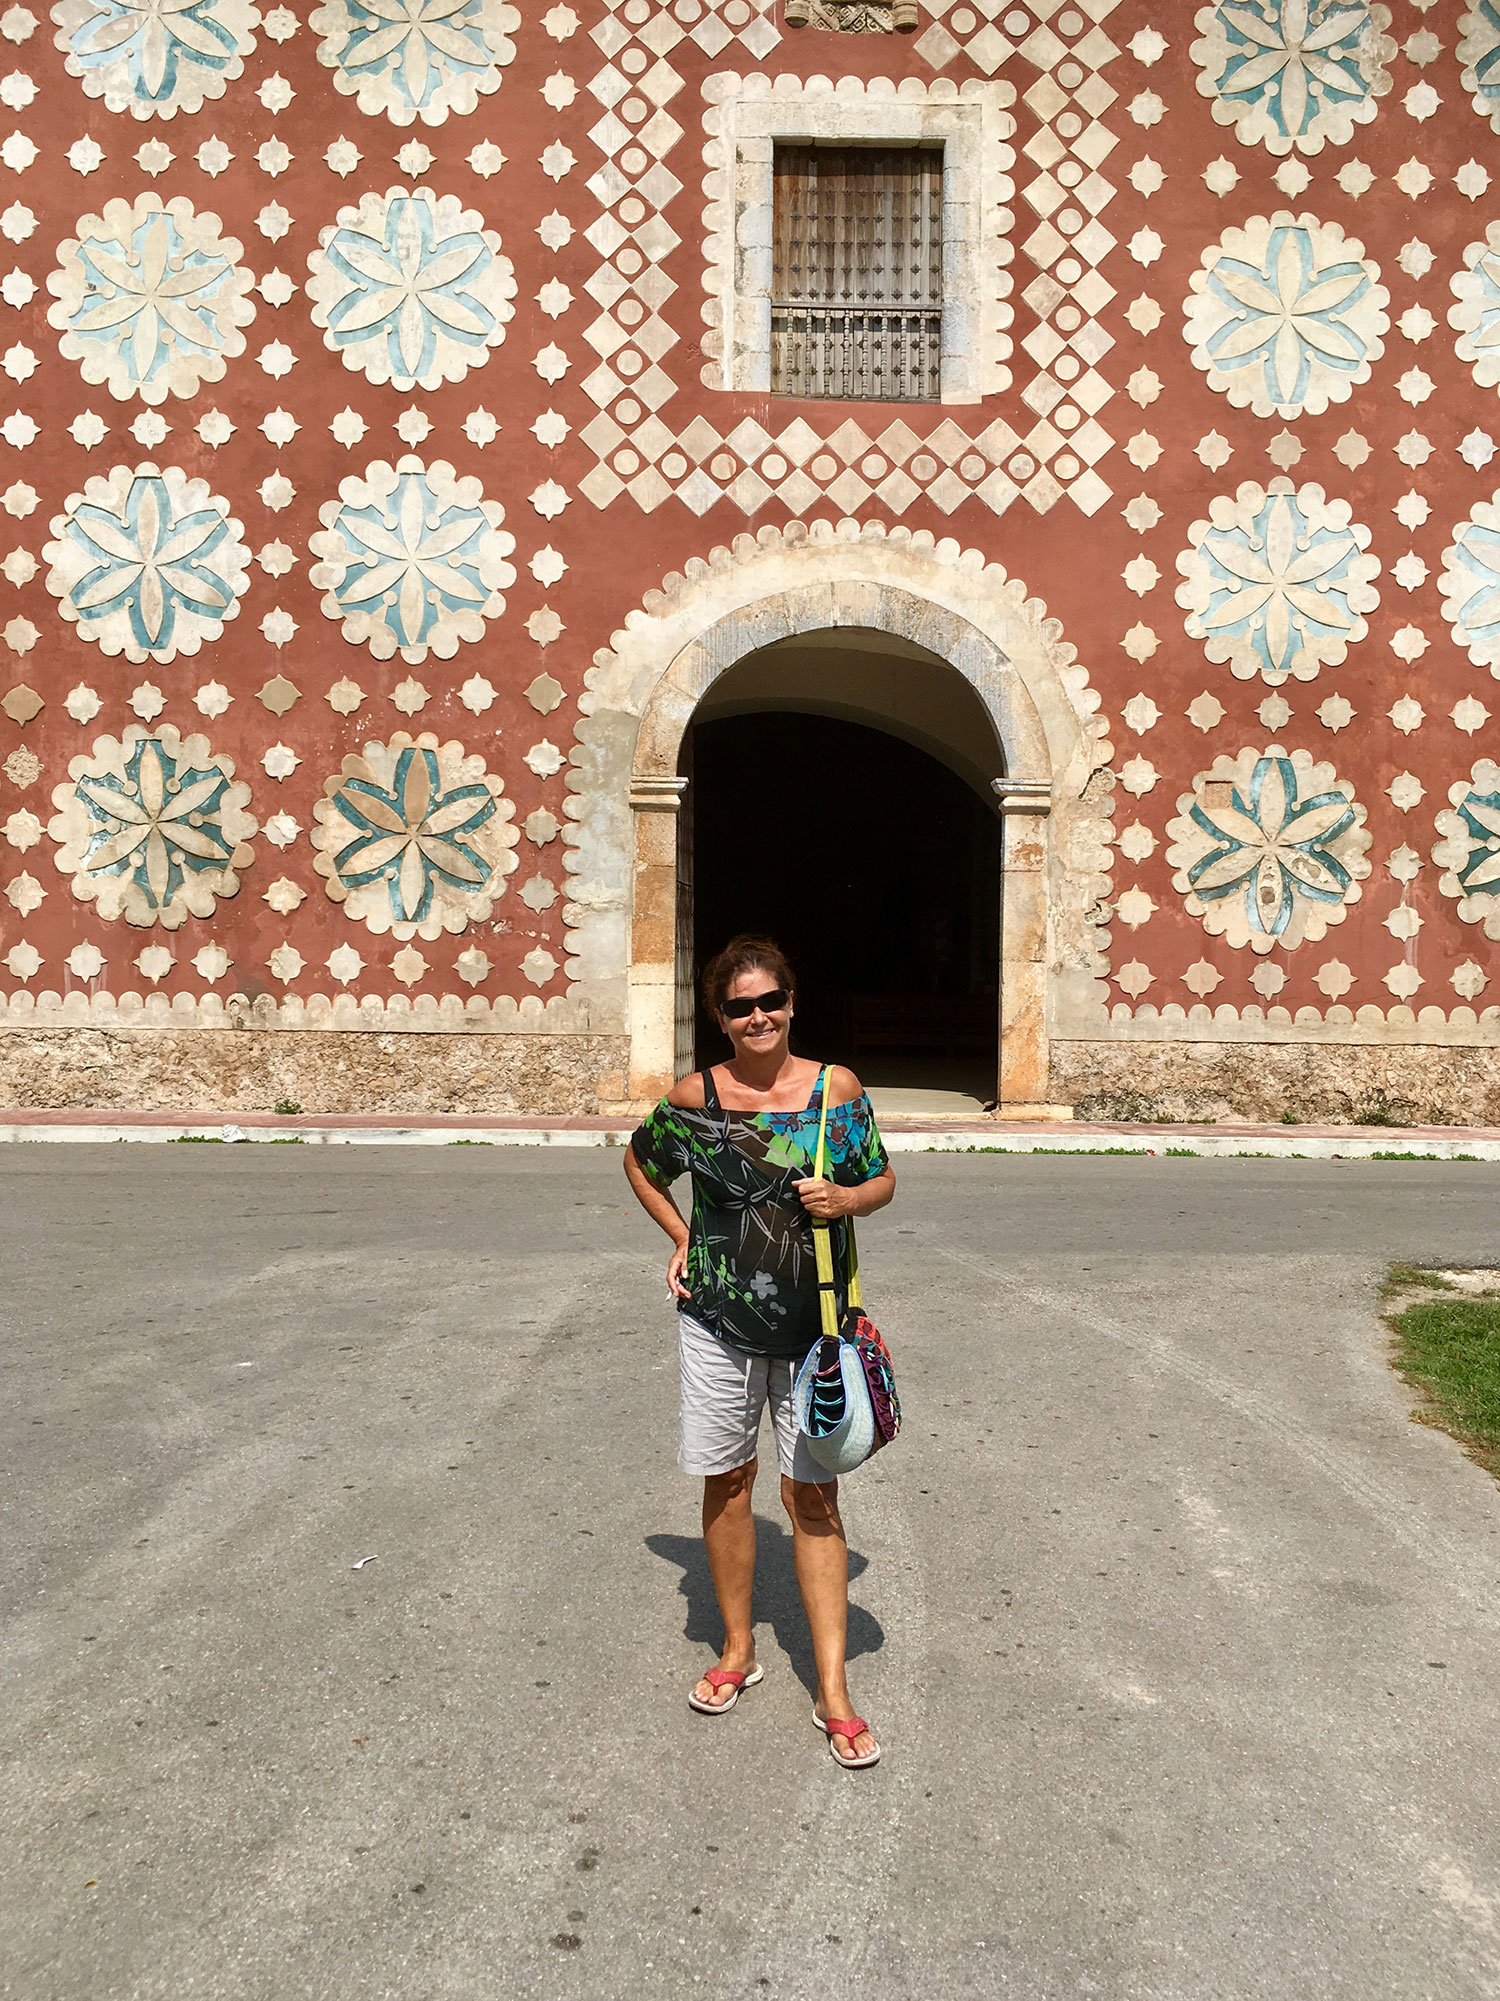 Hammocks_and_Ruins_What_to_Do_Mexico_Mayan_pyramid_town_Uayma_24.jpg